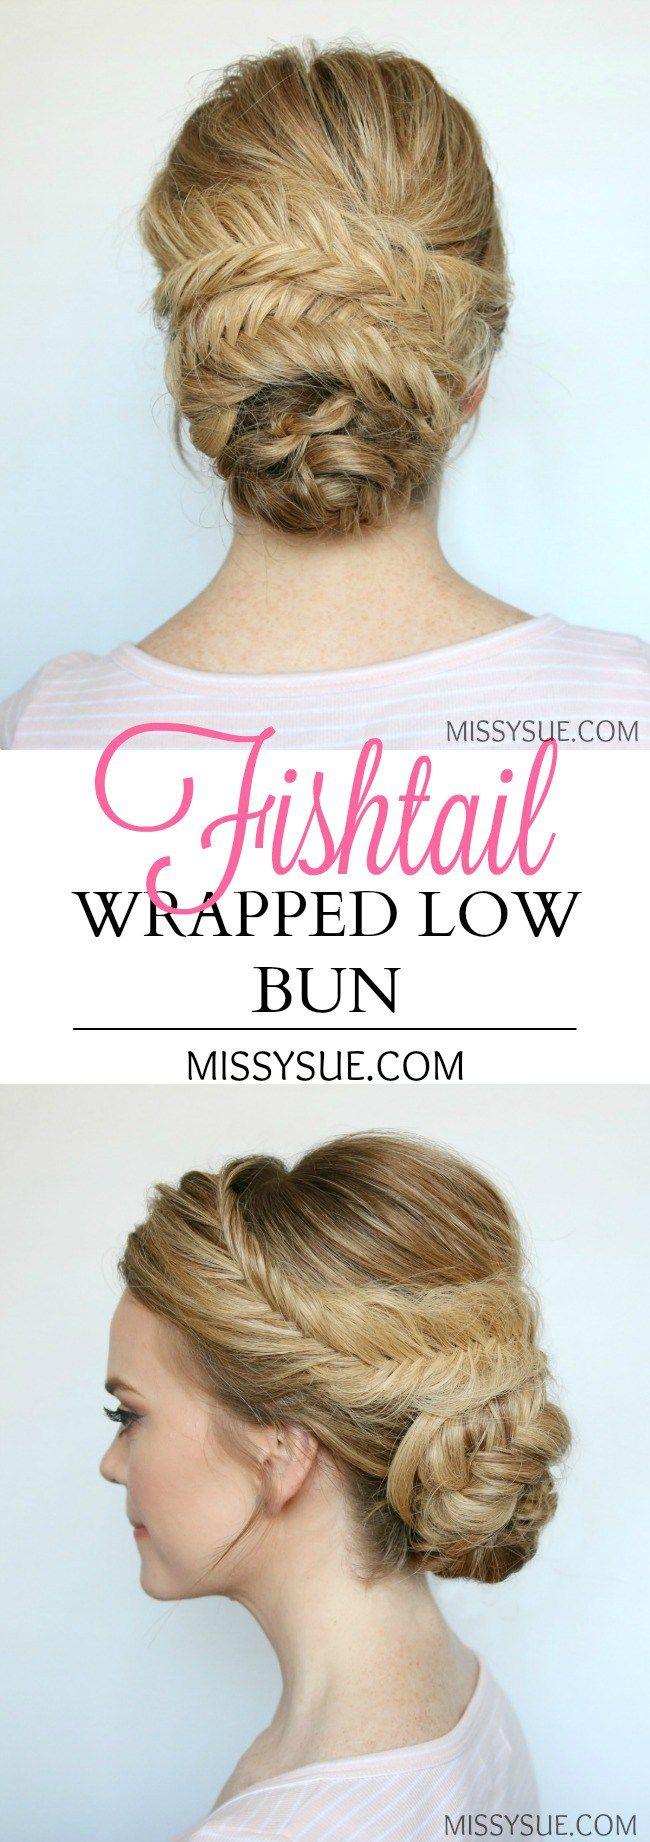 fishtail-wrapped-low-bun-tutorial